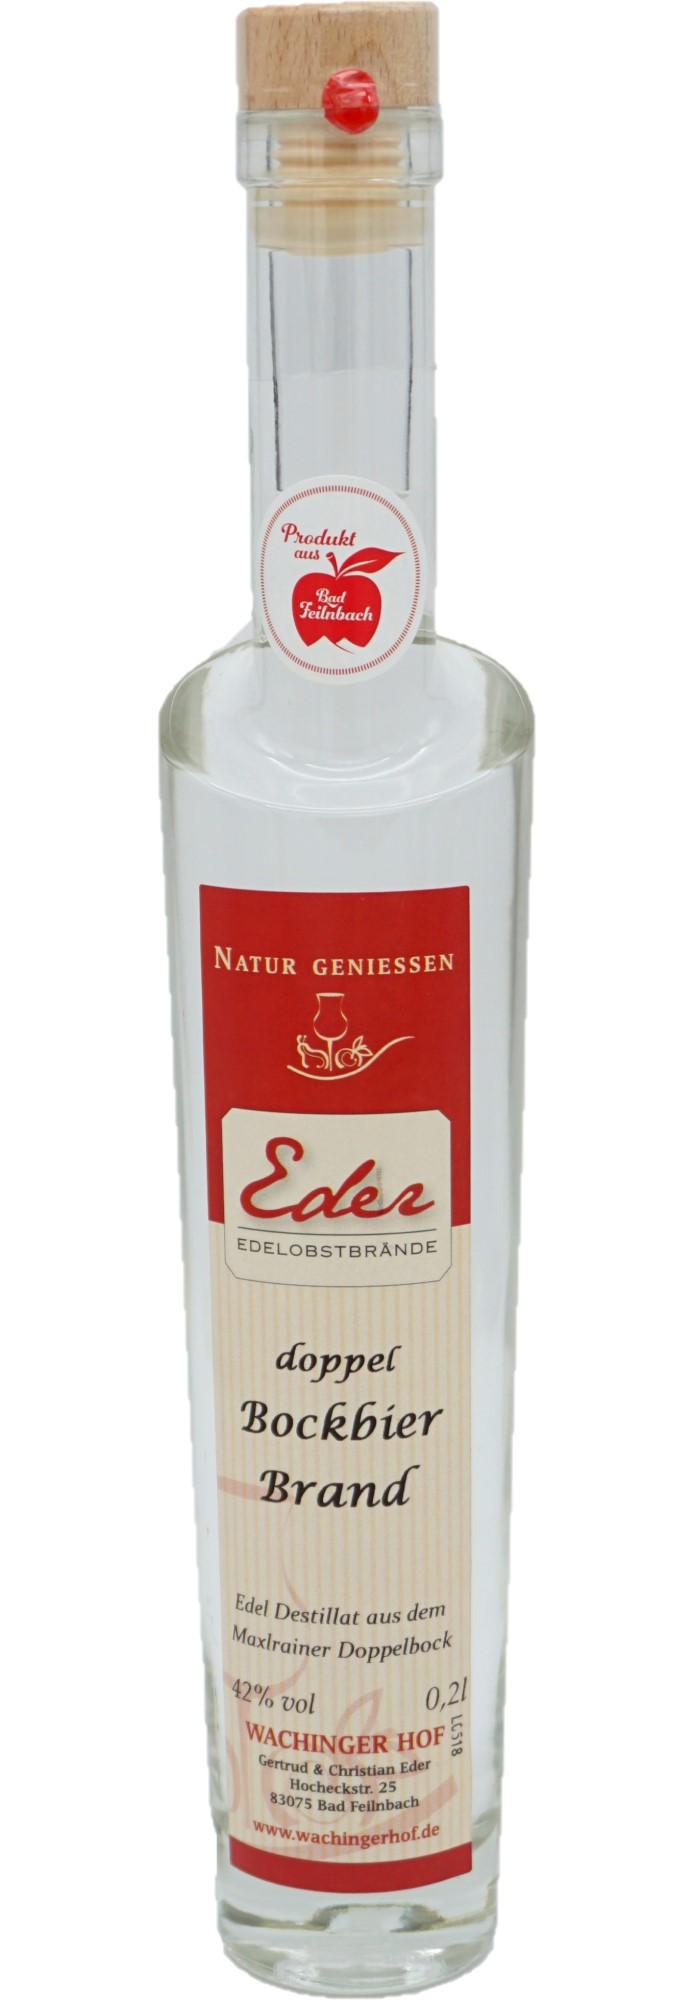 Bock Bier Brand (Maxlr. Jubilator)